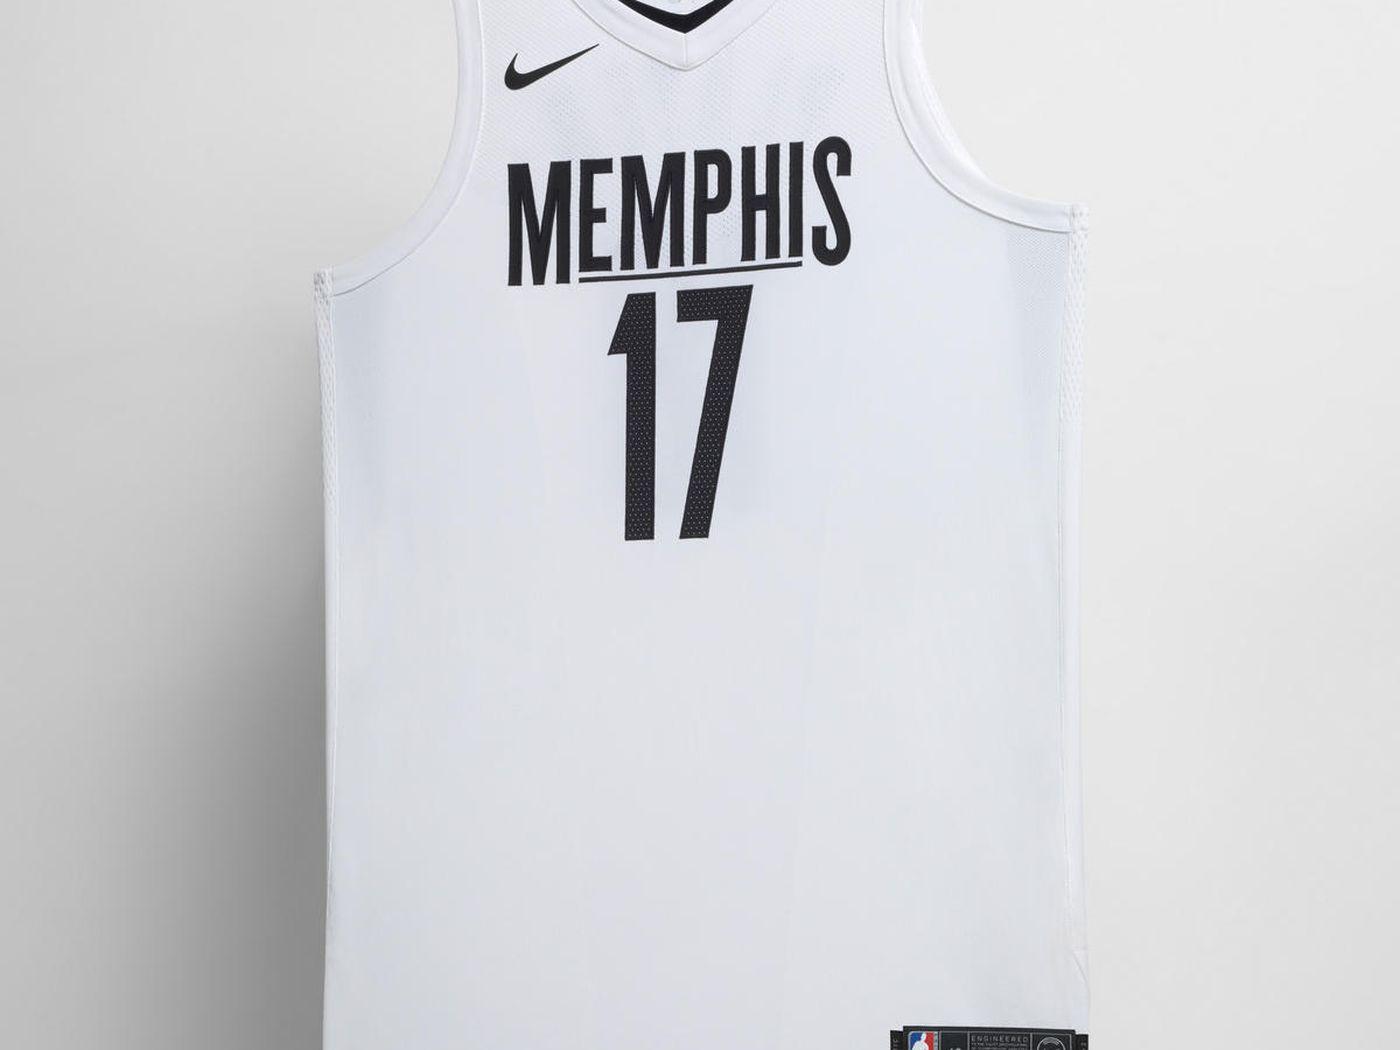 63db01808e0 Learn the local inspiration behind each of NIKE's NBA City Edition Uniforms  - SBNation.com